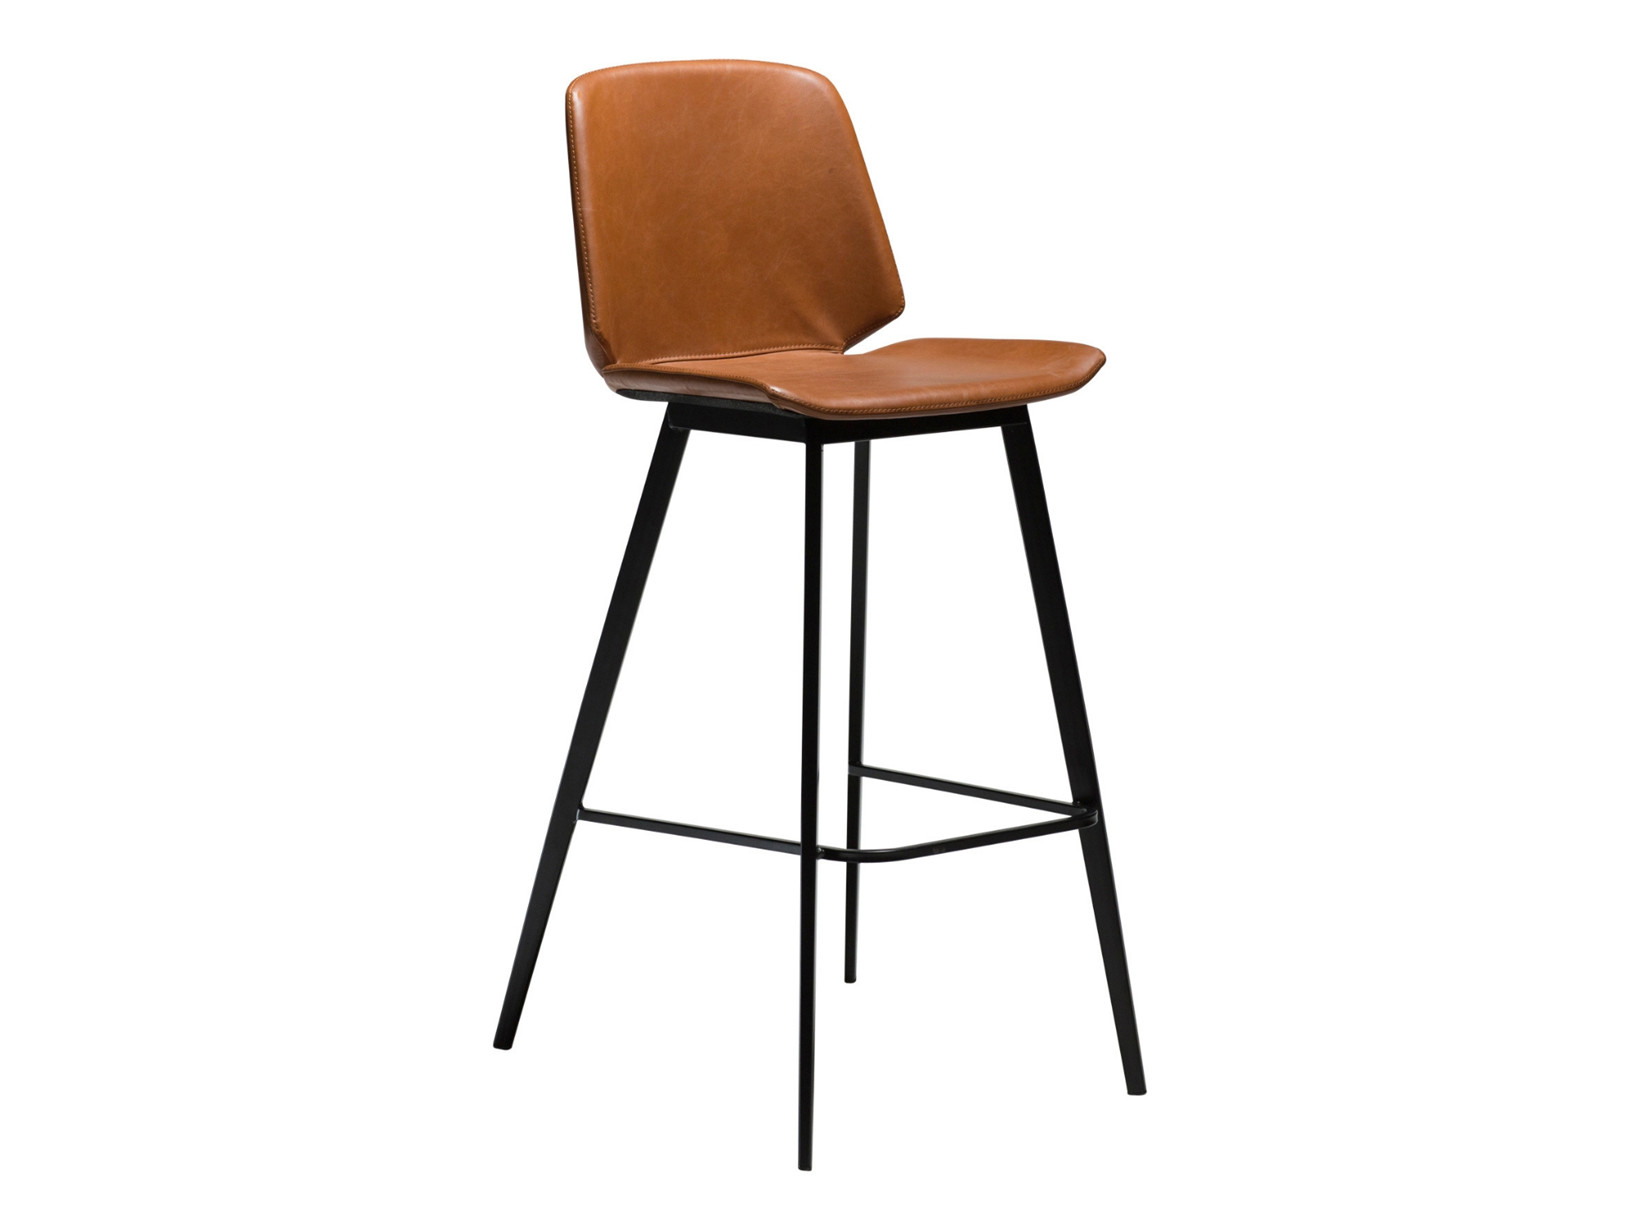 Swing barstol - Lysebrun læderlook